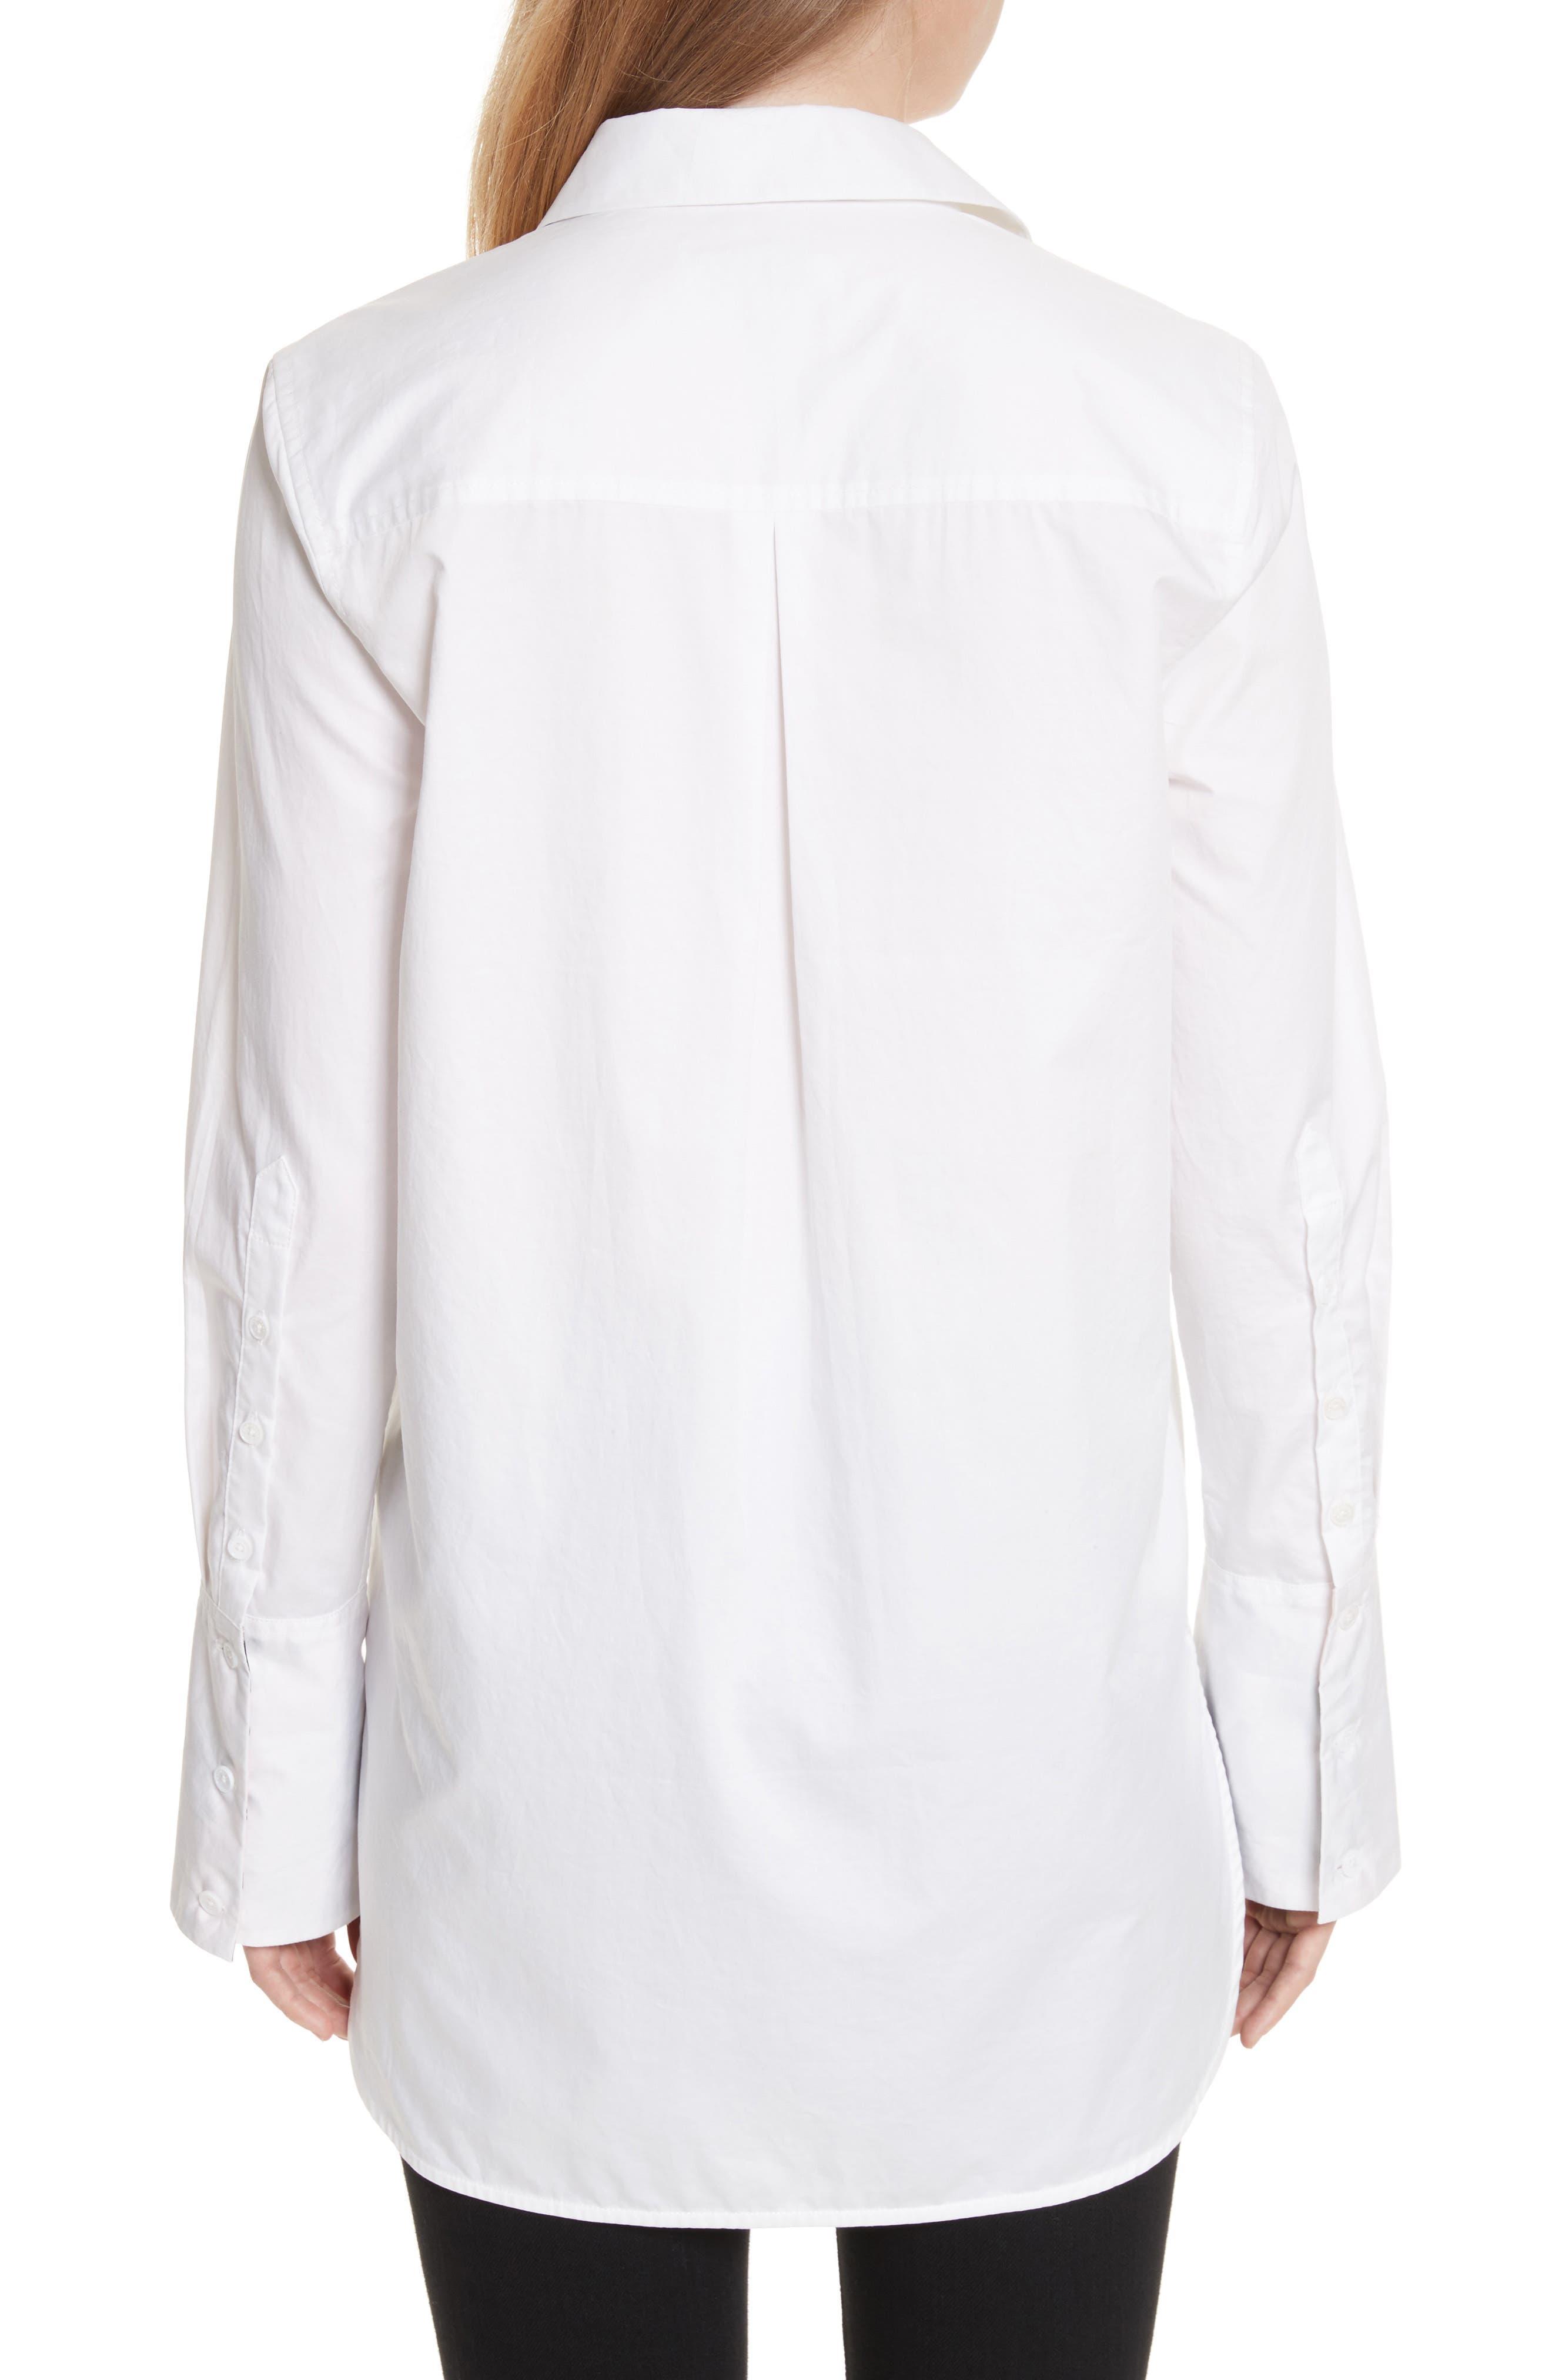 Arlette Cotton Shirt,                             Alternate thumbnail 2, color,                             Bright White